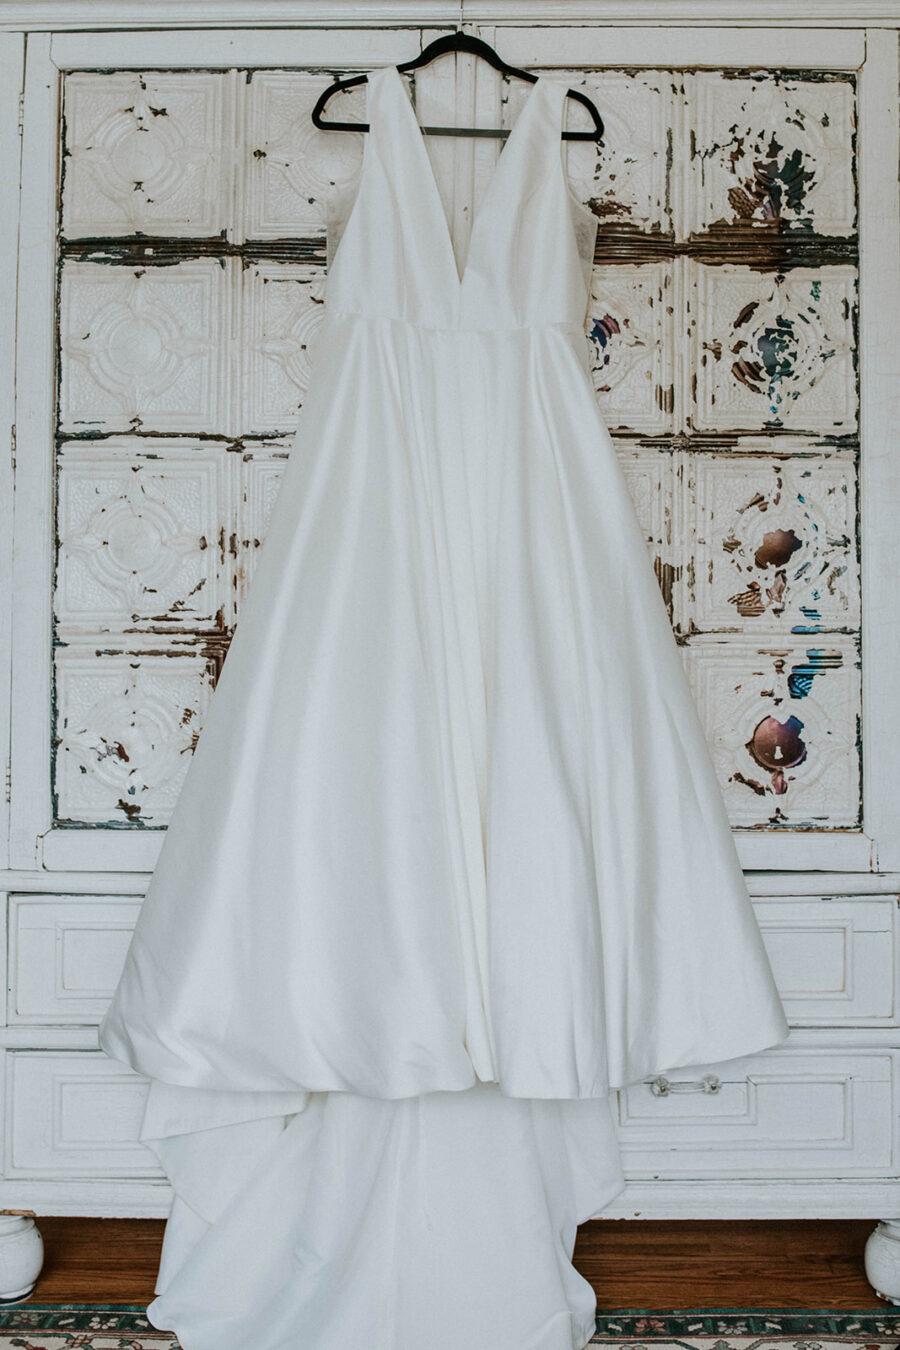 Hanging satin wedding dress with a v-neckline